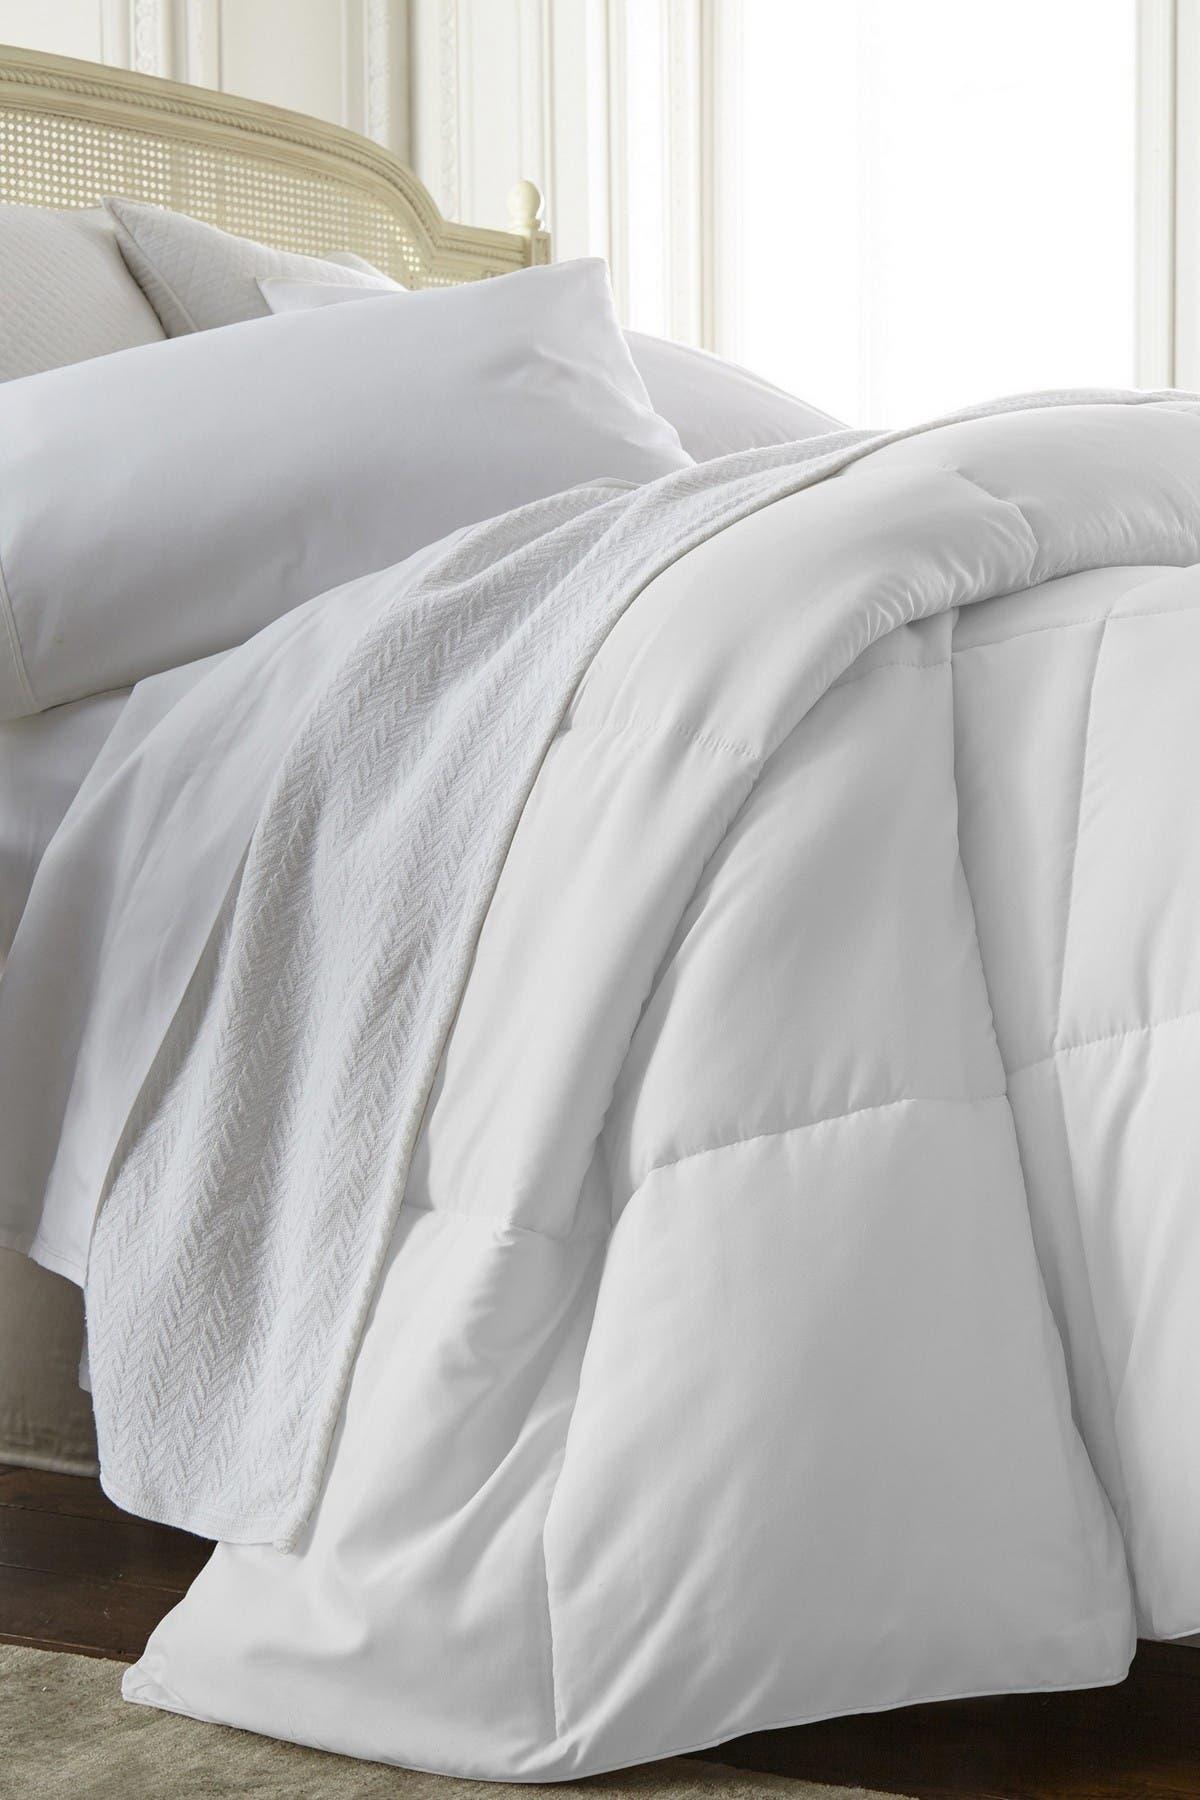 Image of IENJOY HOME Home Spun All Season Premium Down Alternative Twin Comforter - White